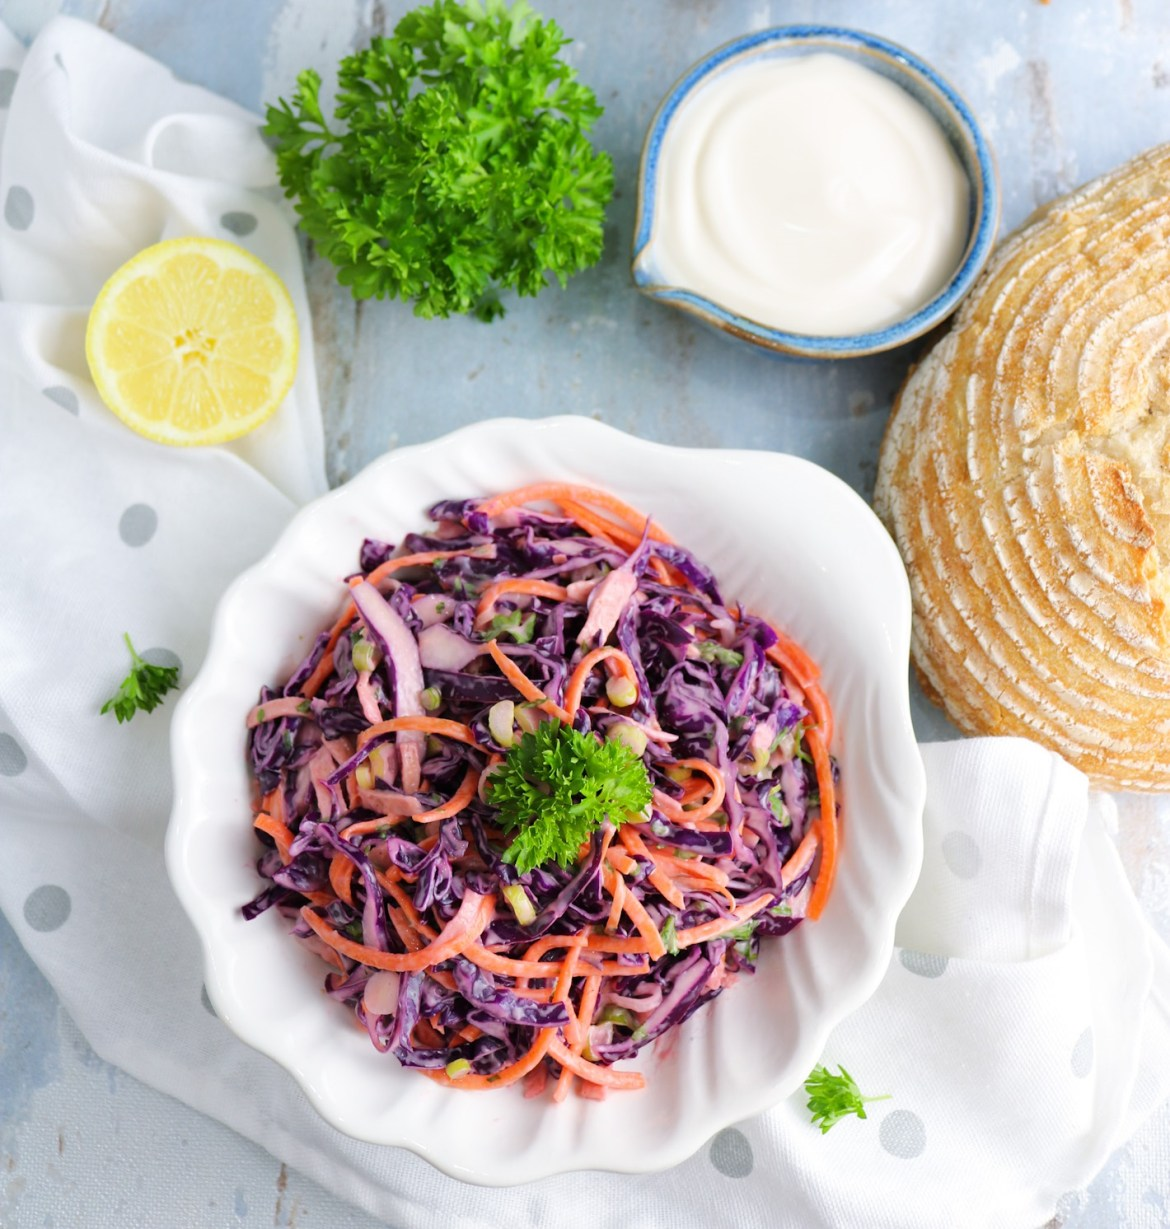 Light Coleslaw Salad